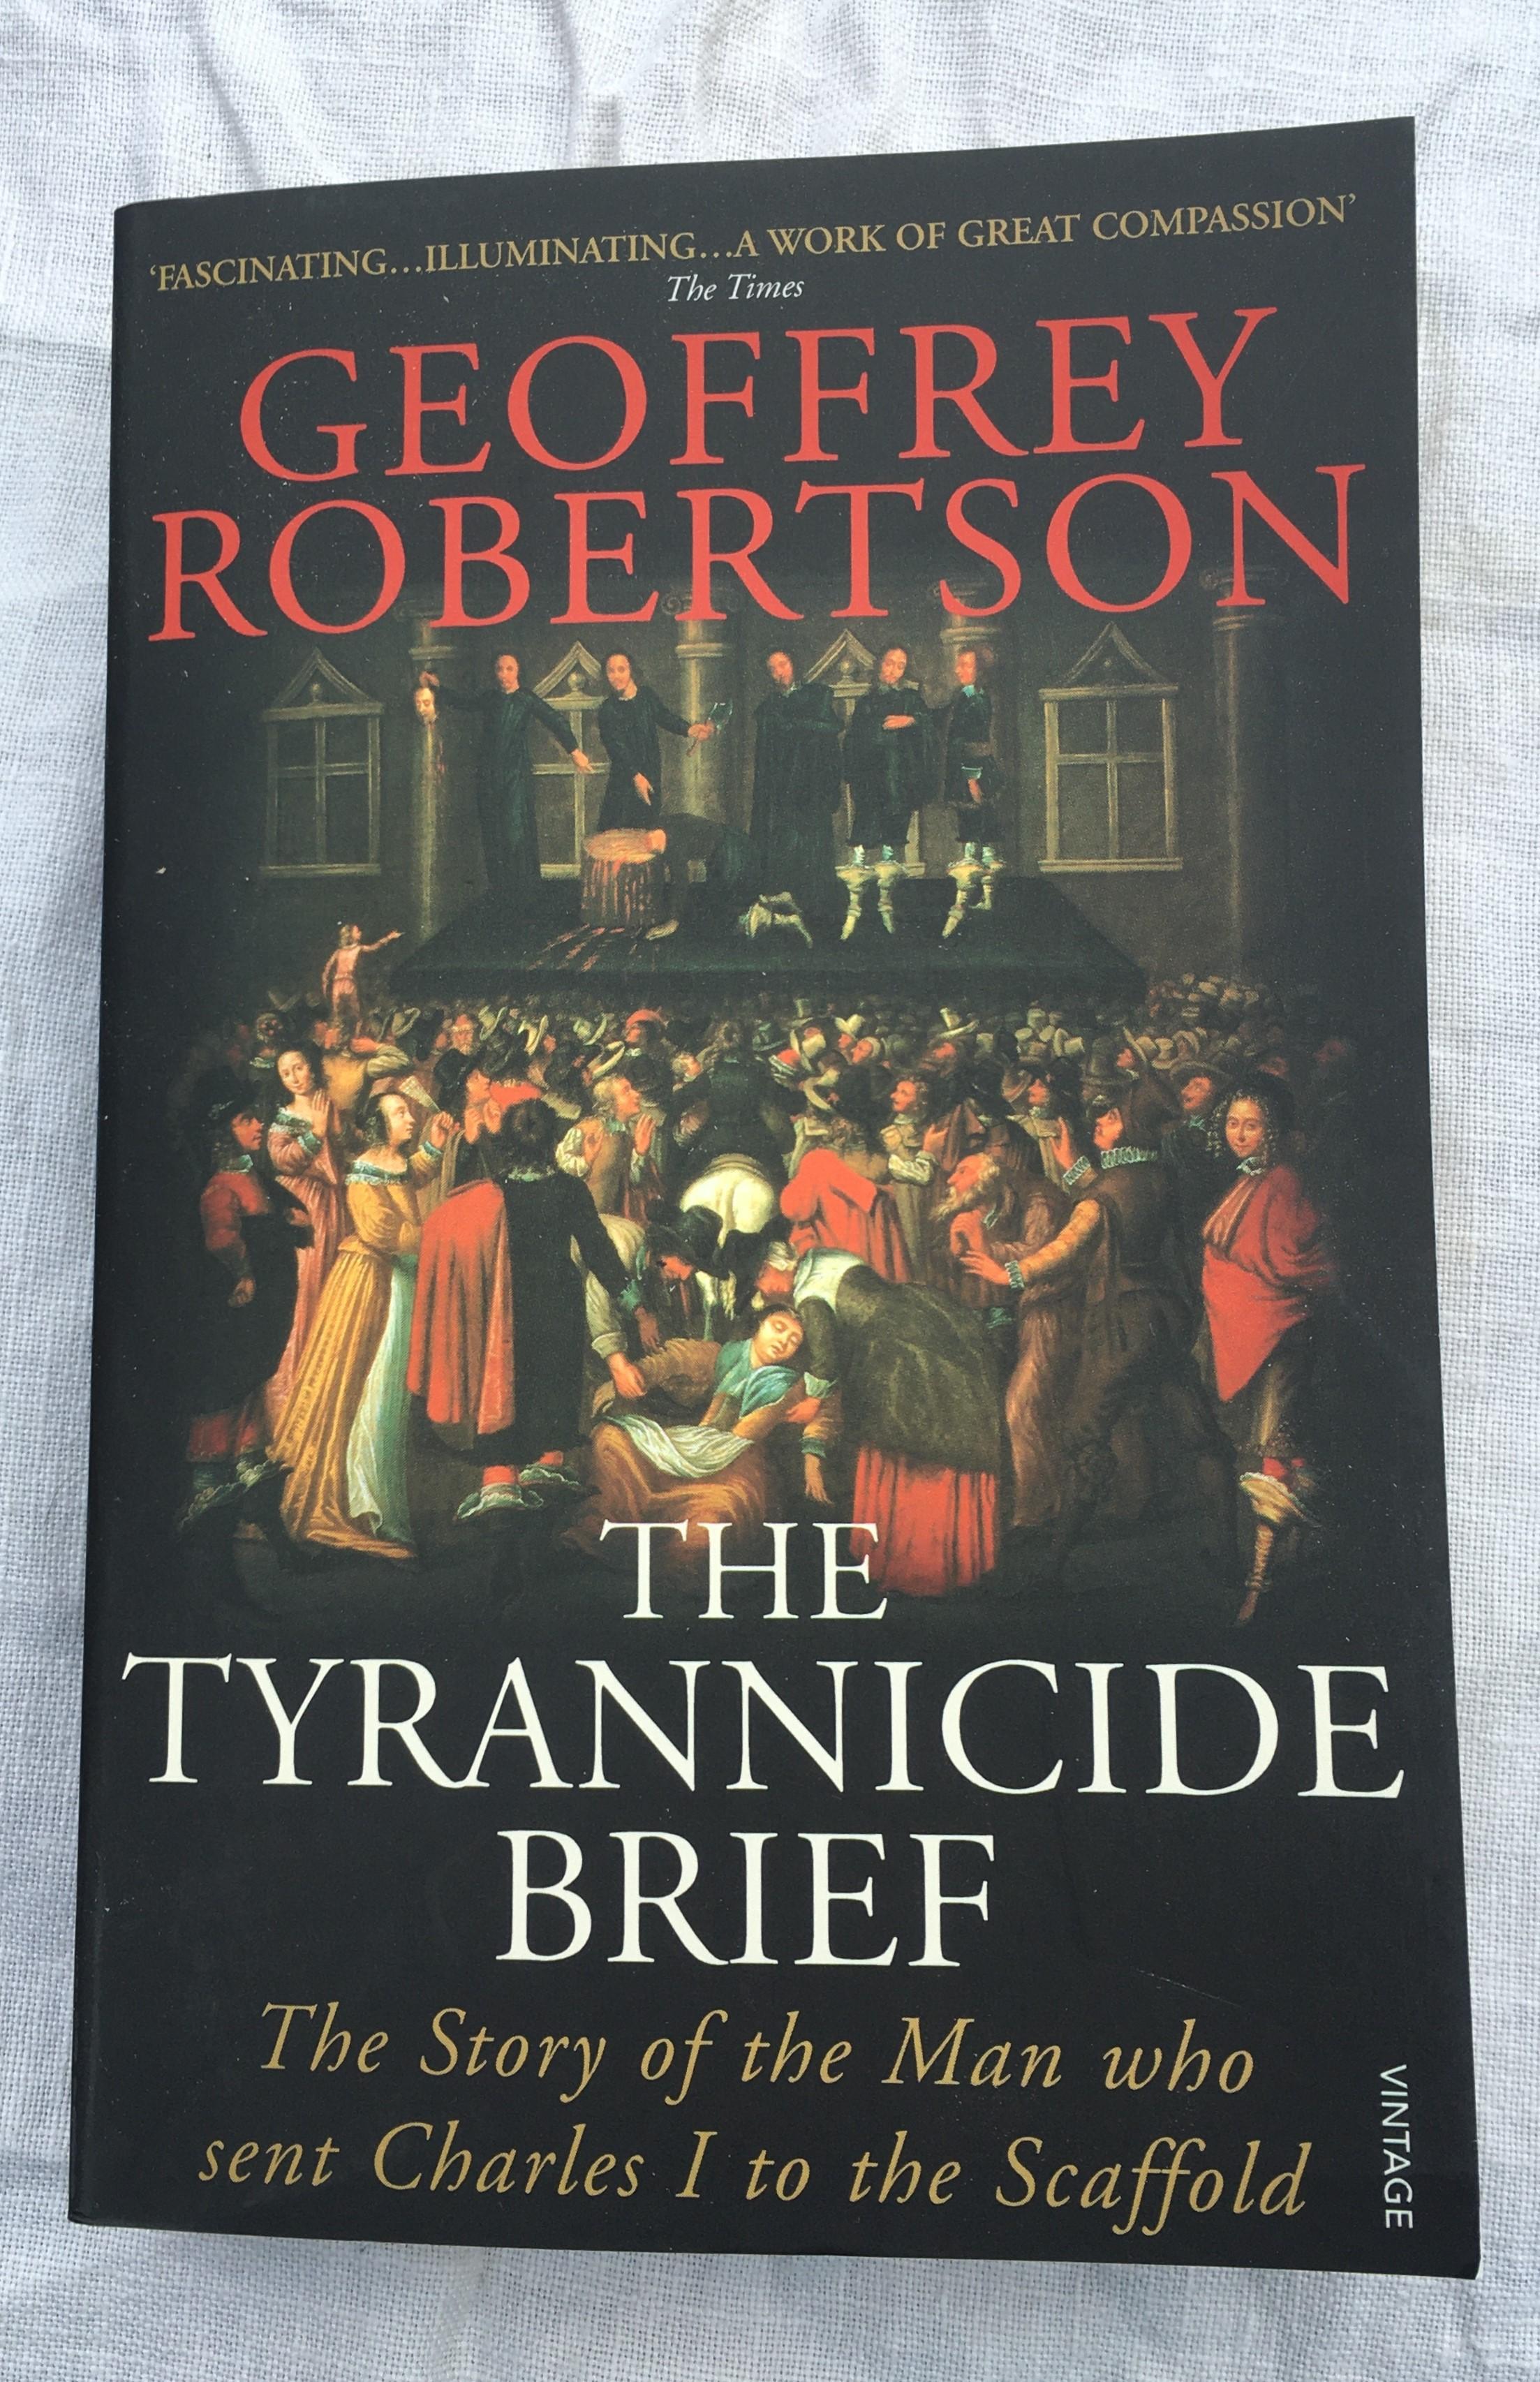 Book: The Tyrannicide Brief  (SKU: BK-FA-035)